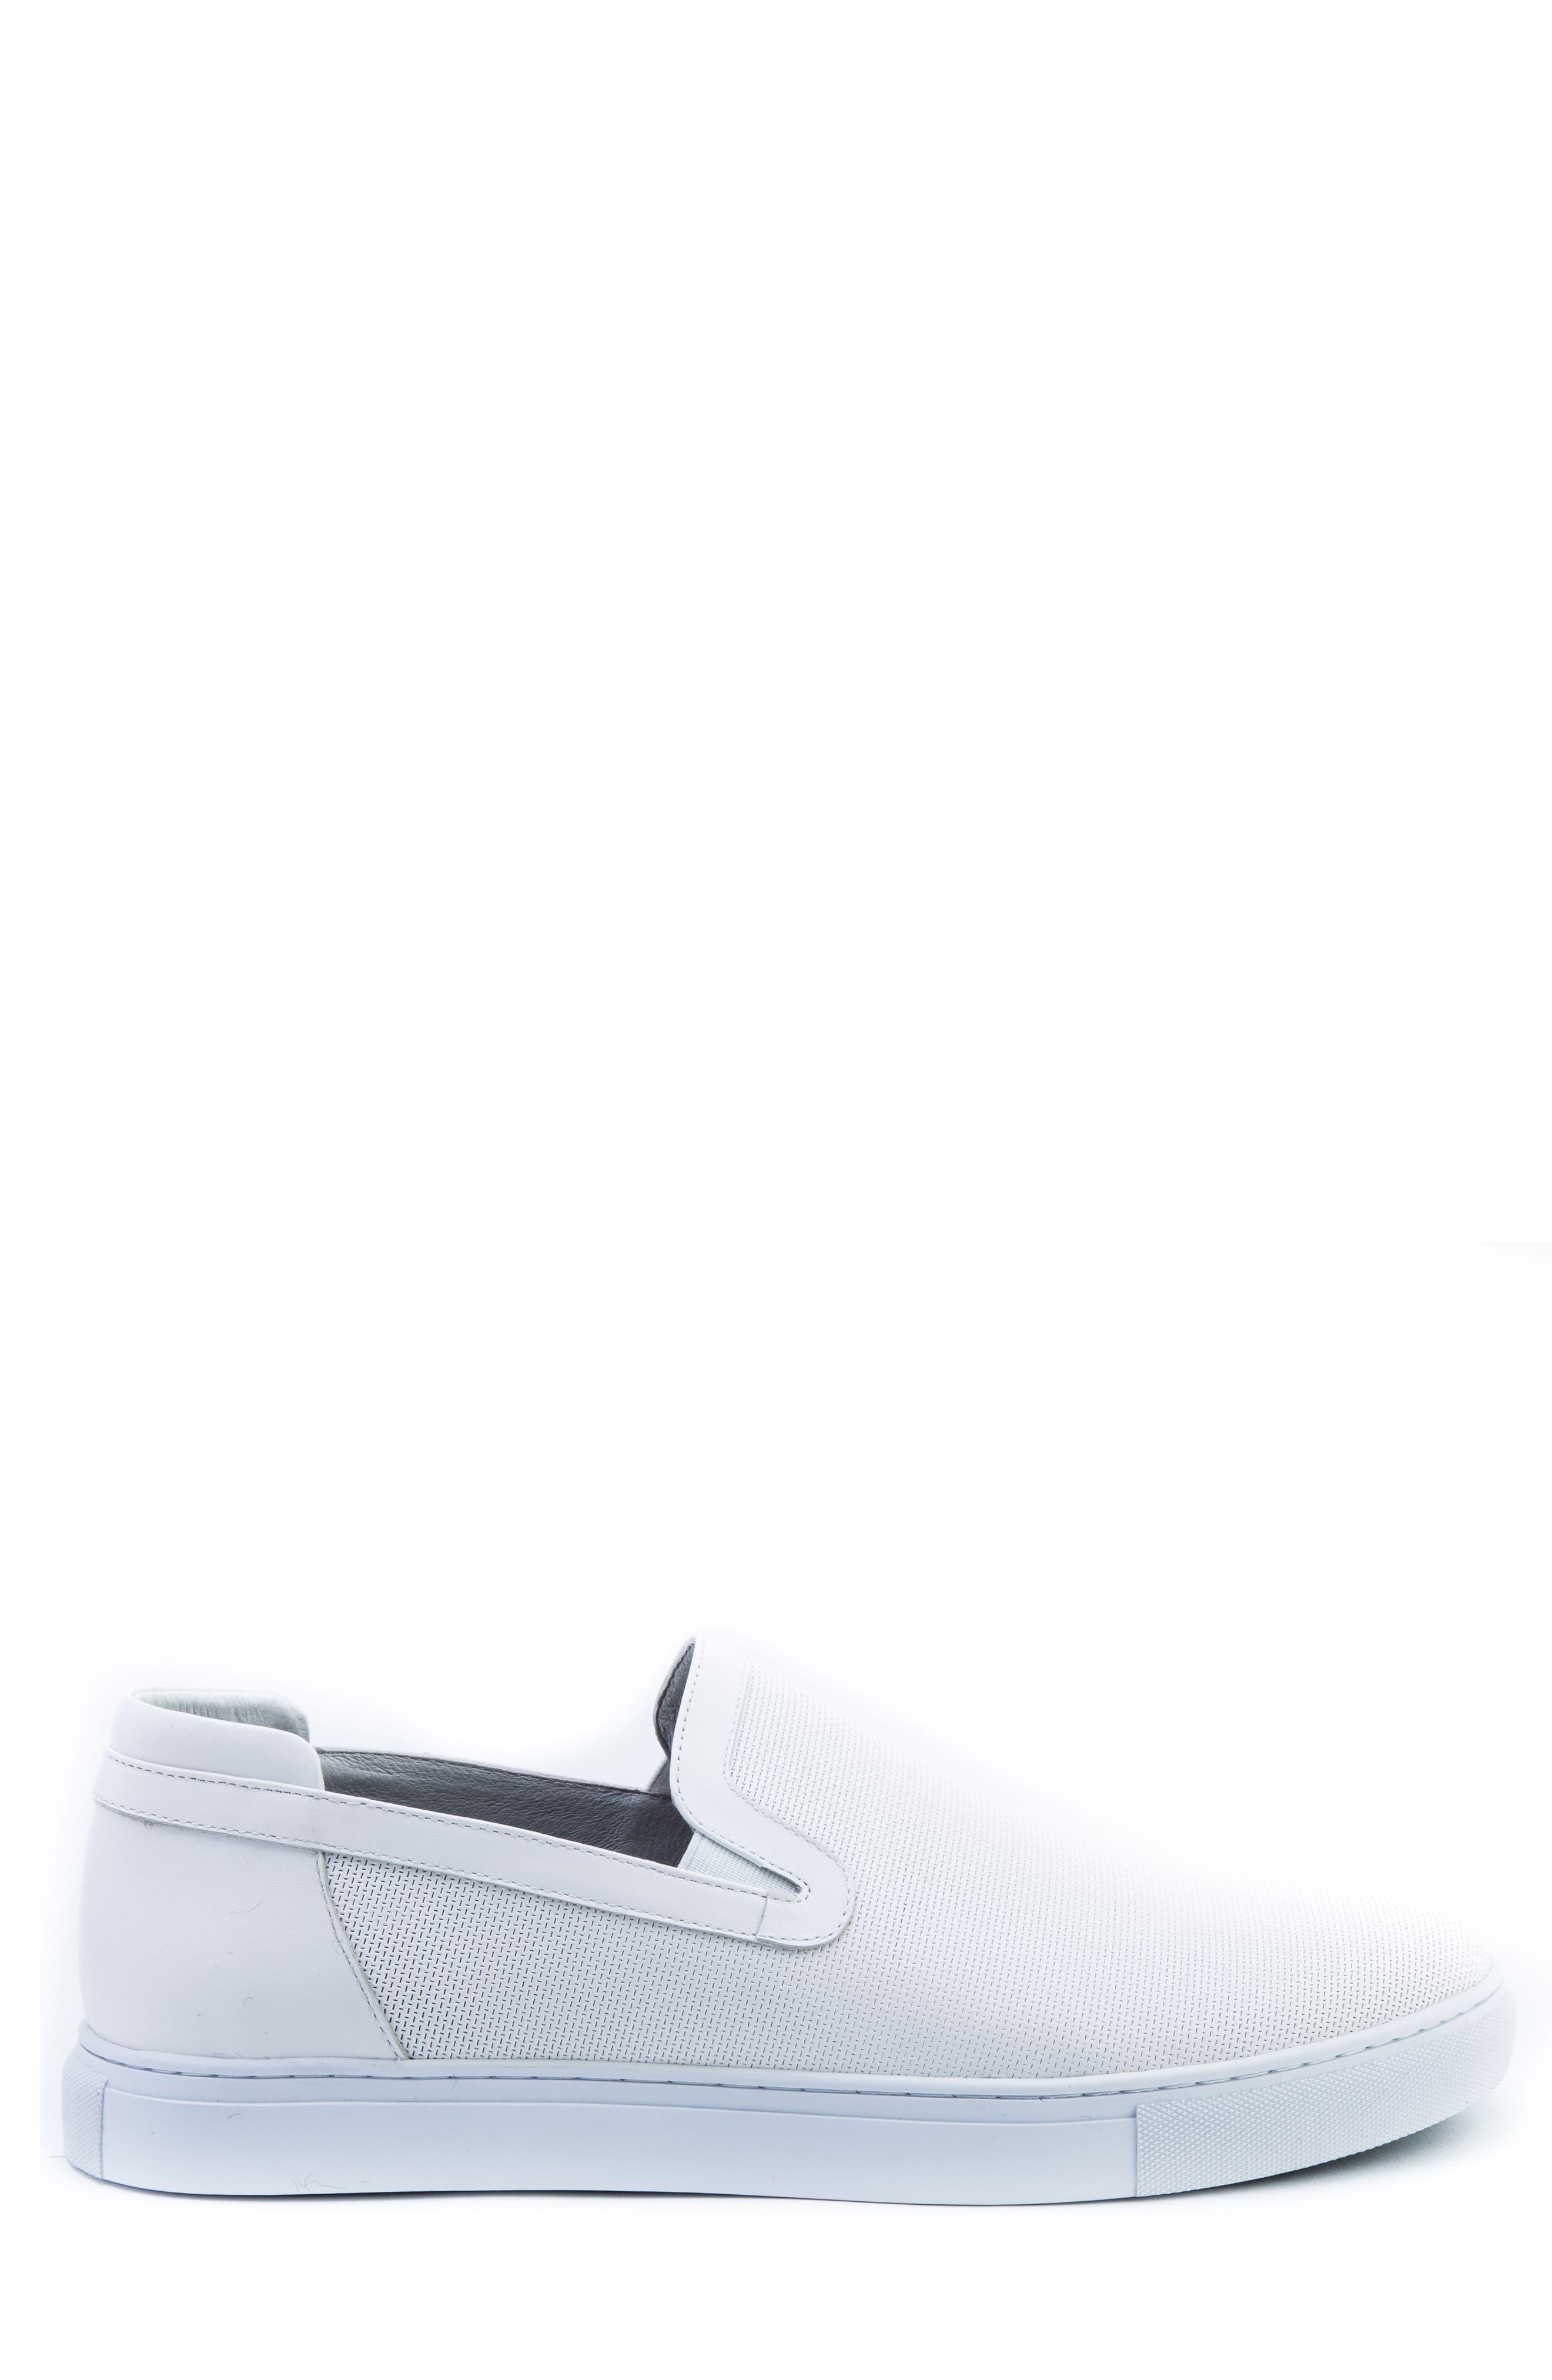 Grant Sneaker,                             Alternate thumbnail 3, color,                             White Leather